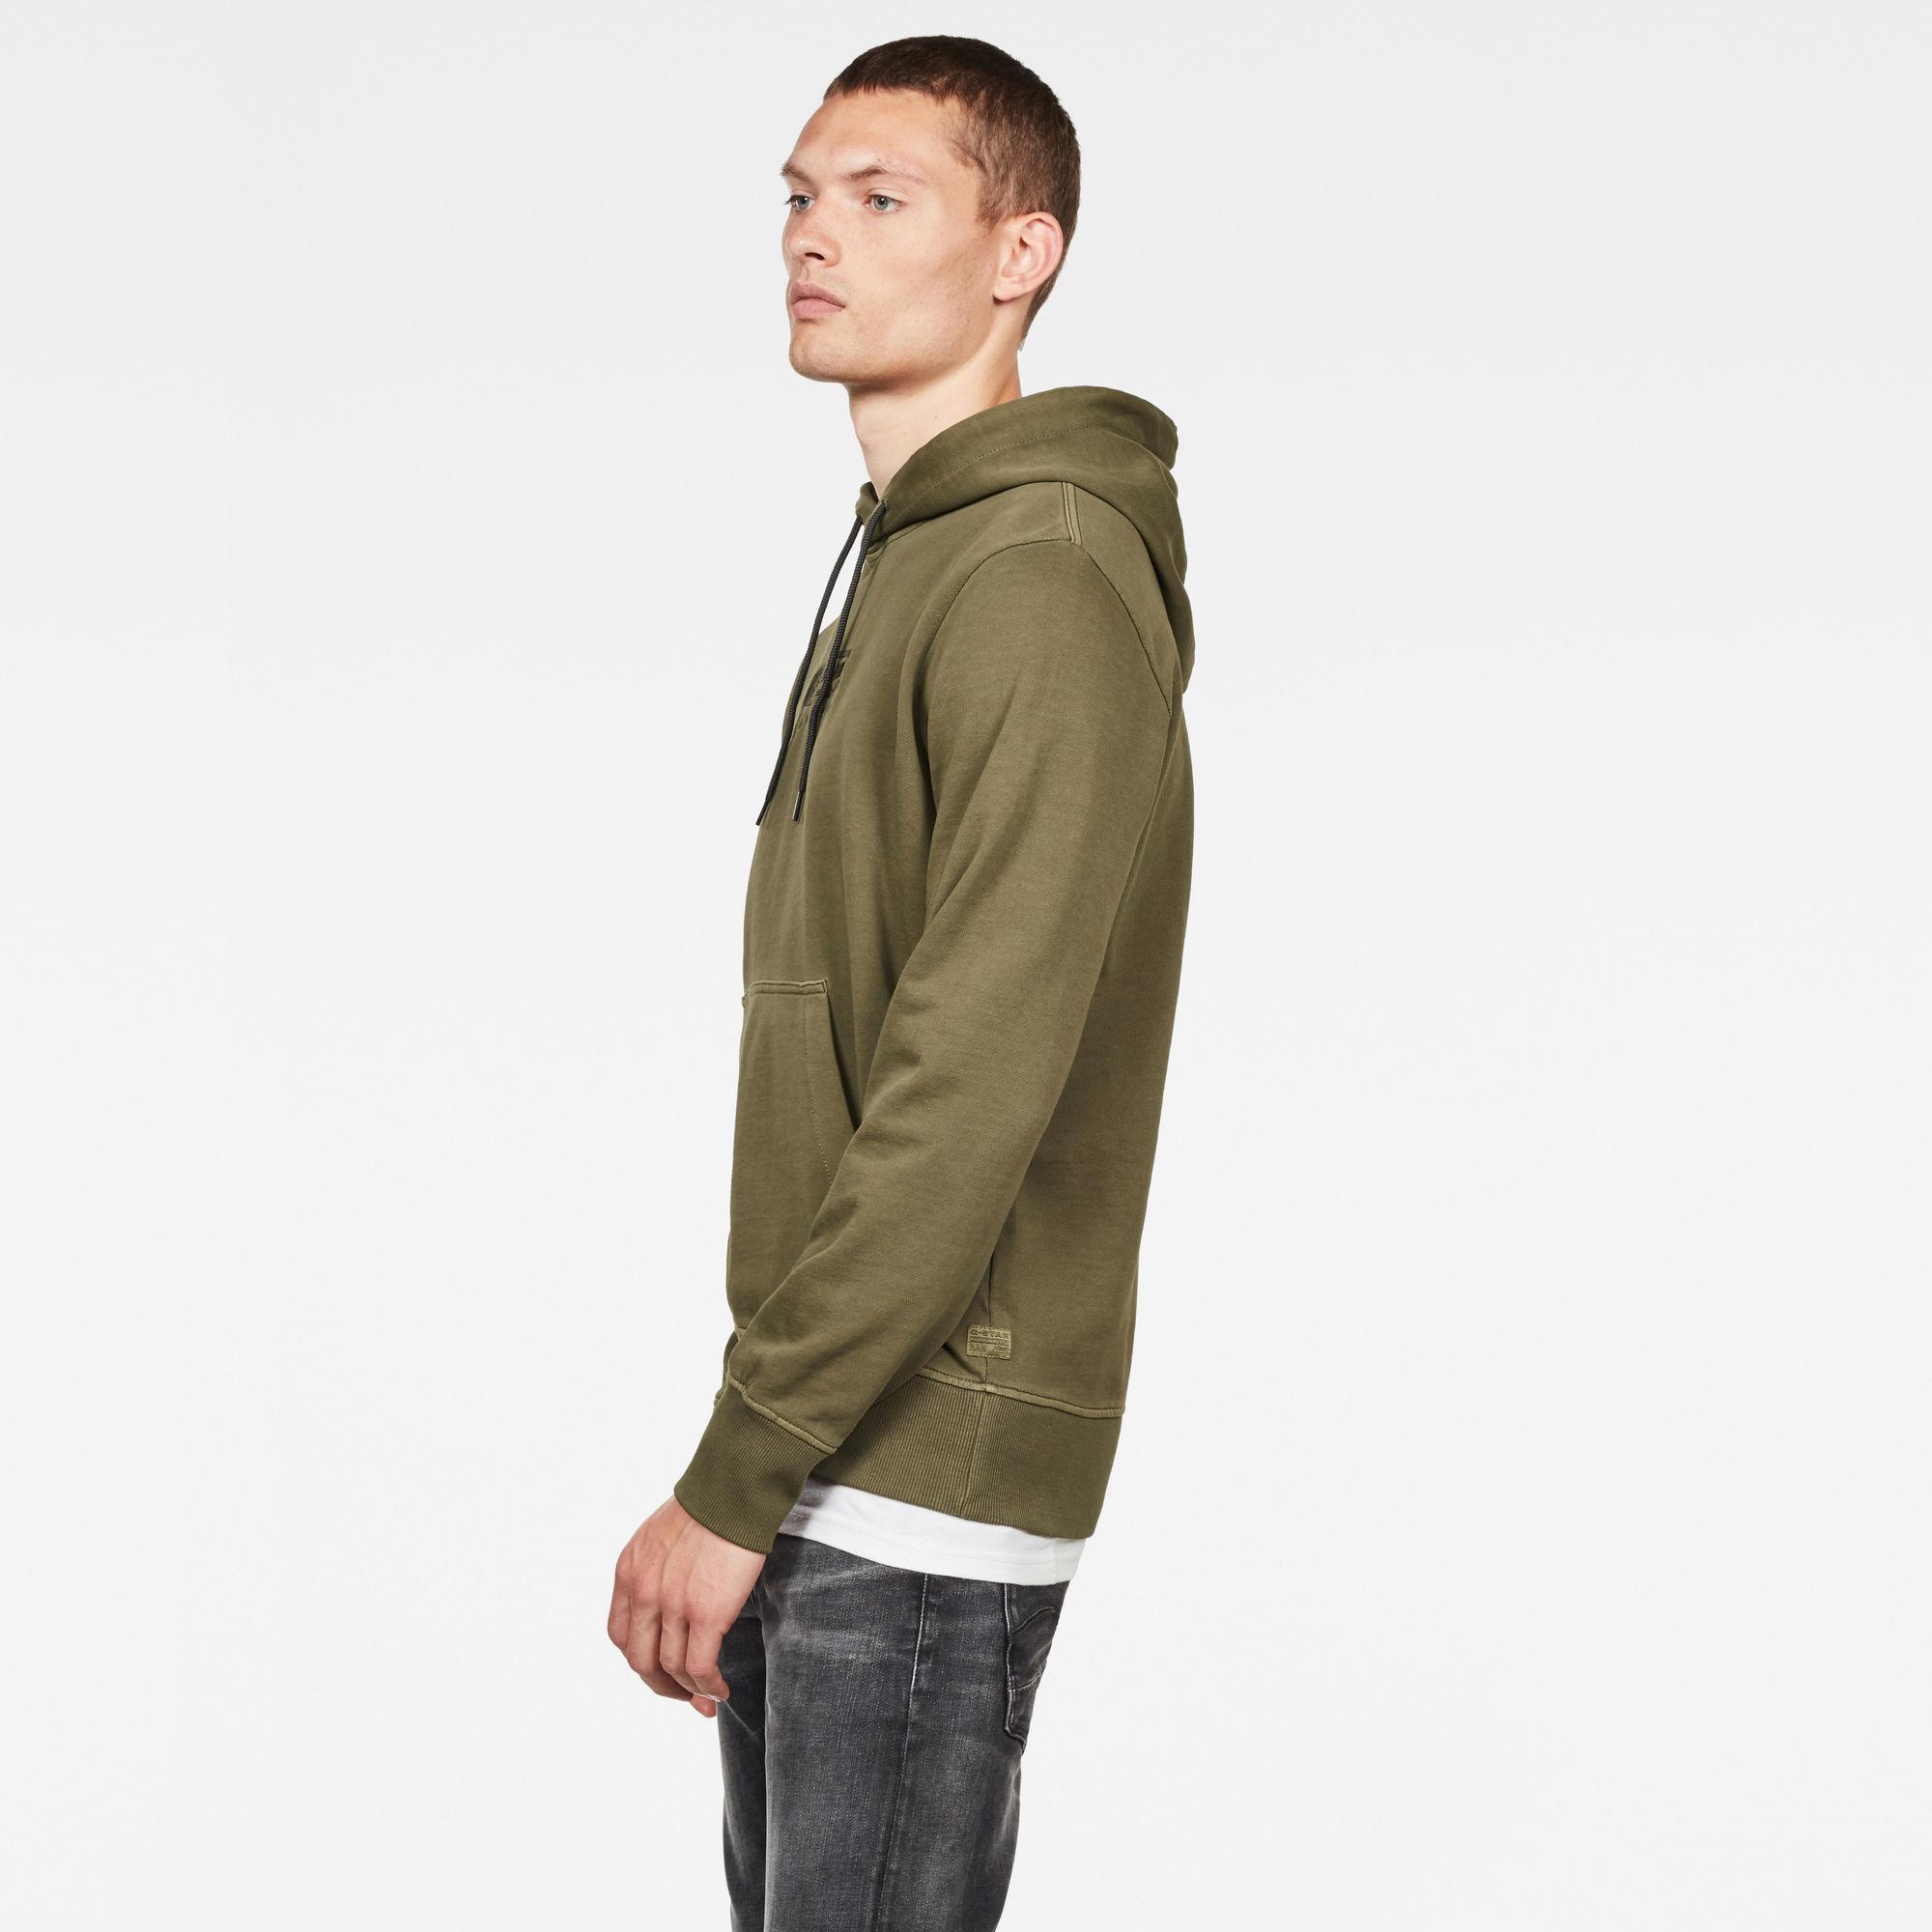 G-Star RAW Graphic 16 Core Sweater